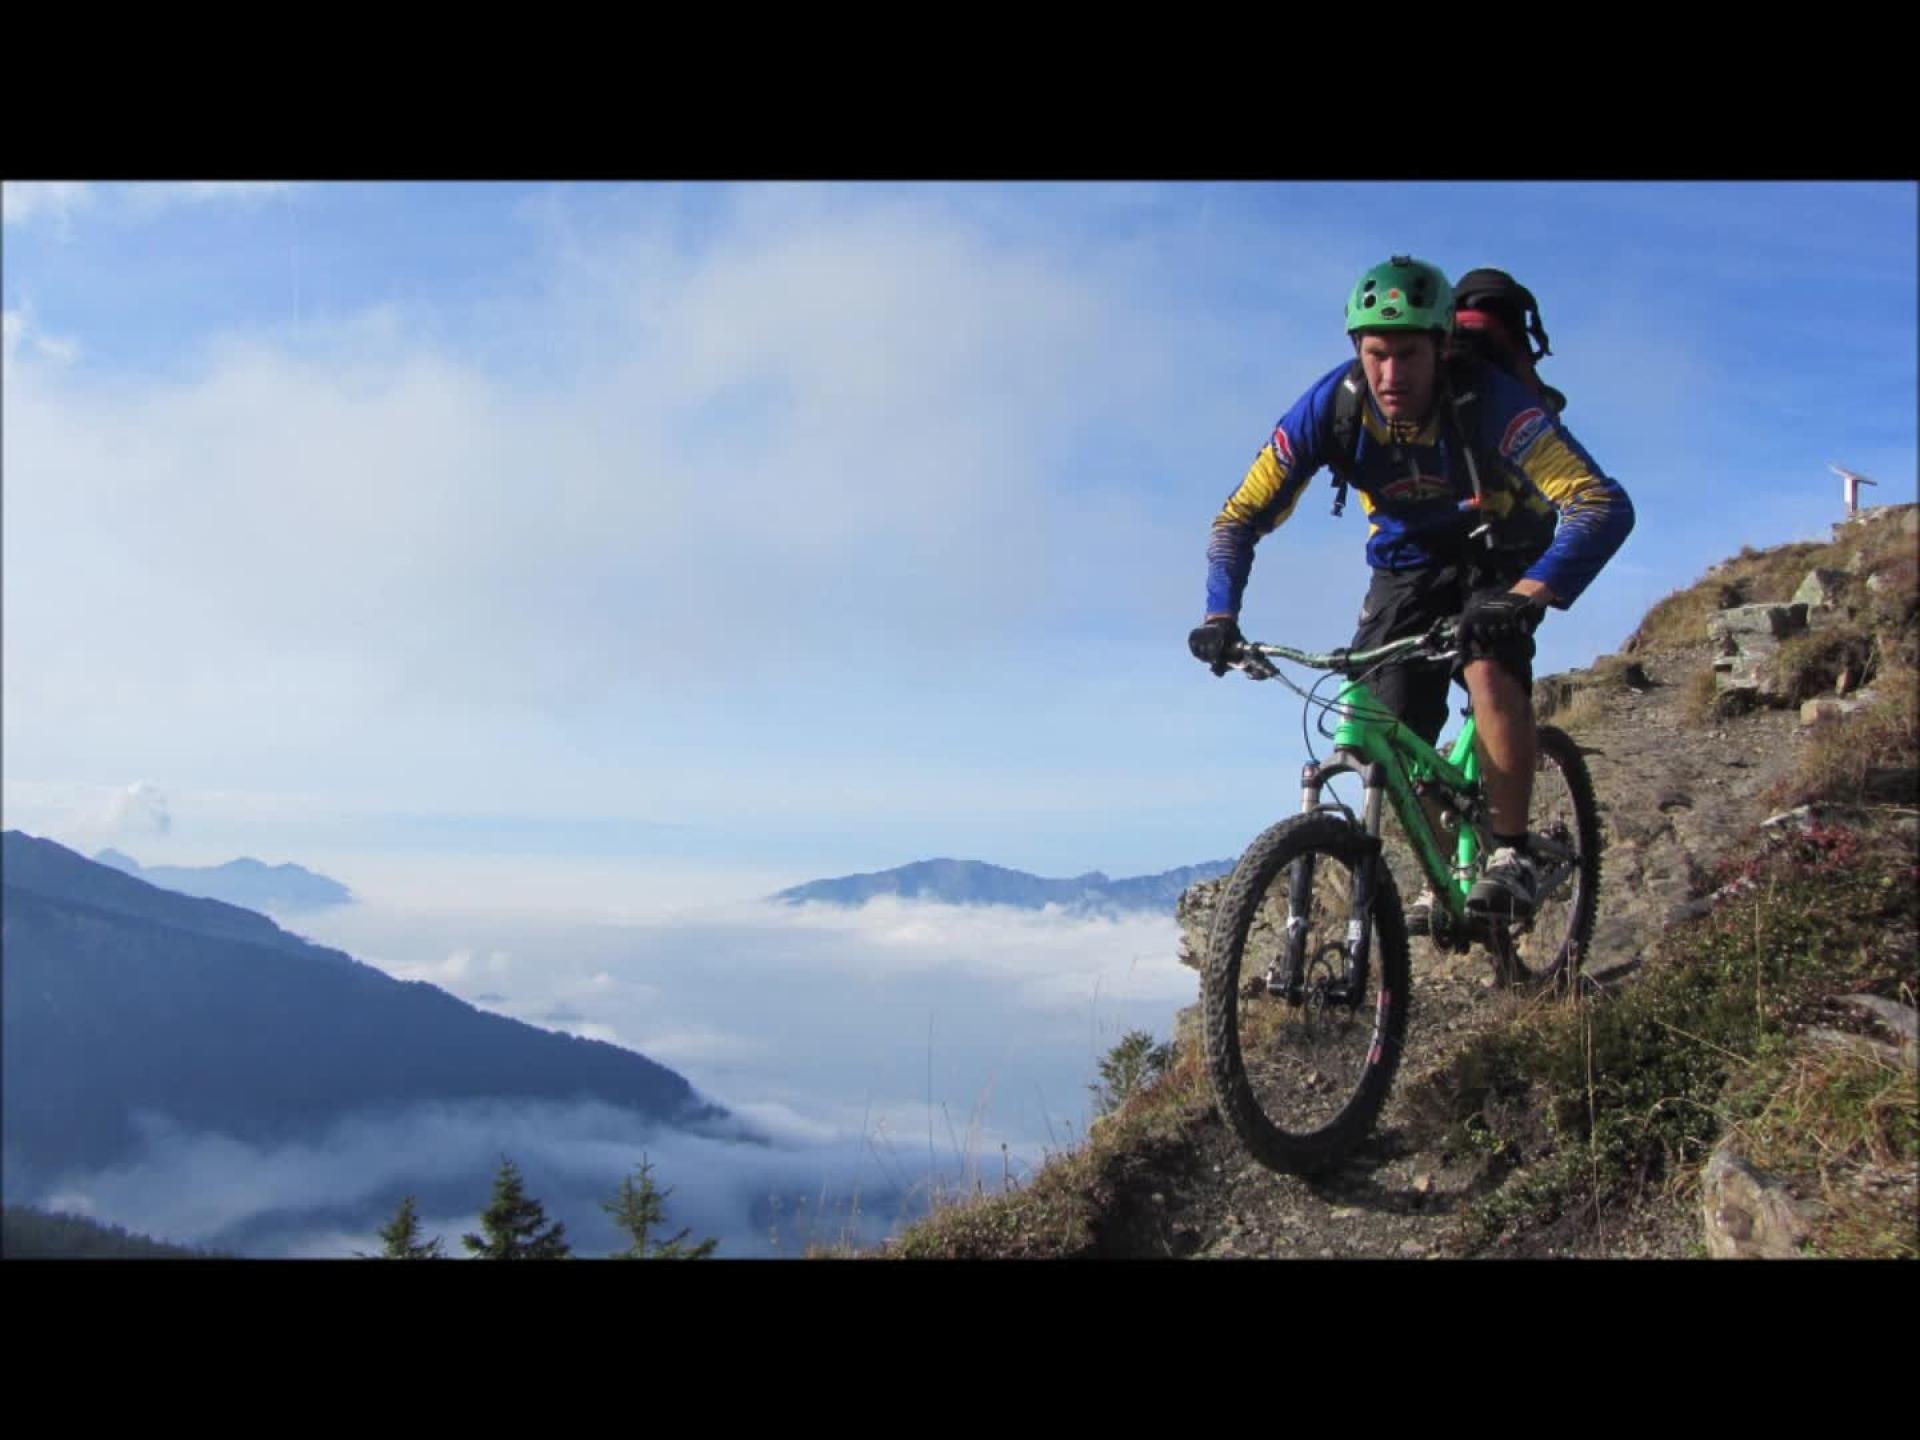 BiketourFlumserberg 8249df 56d55b